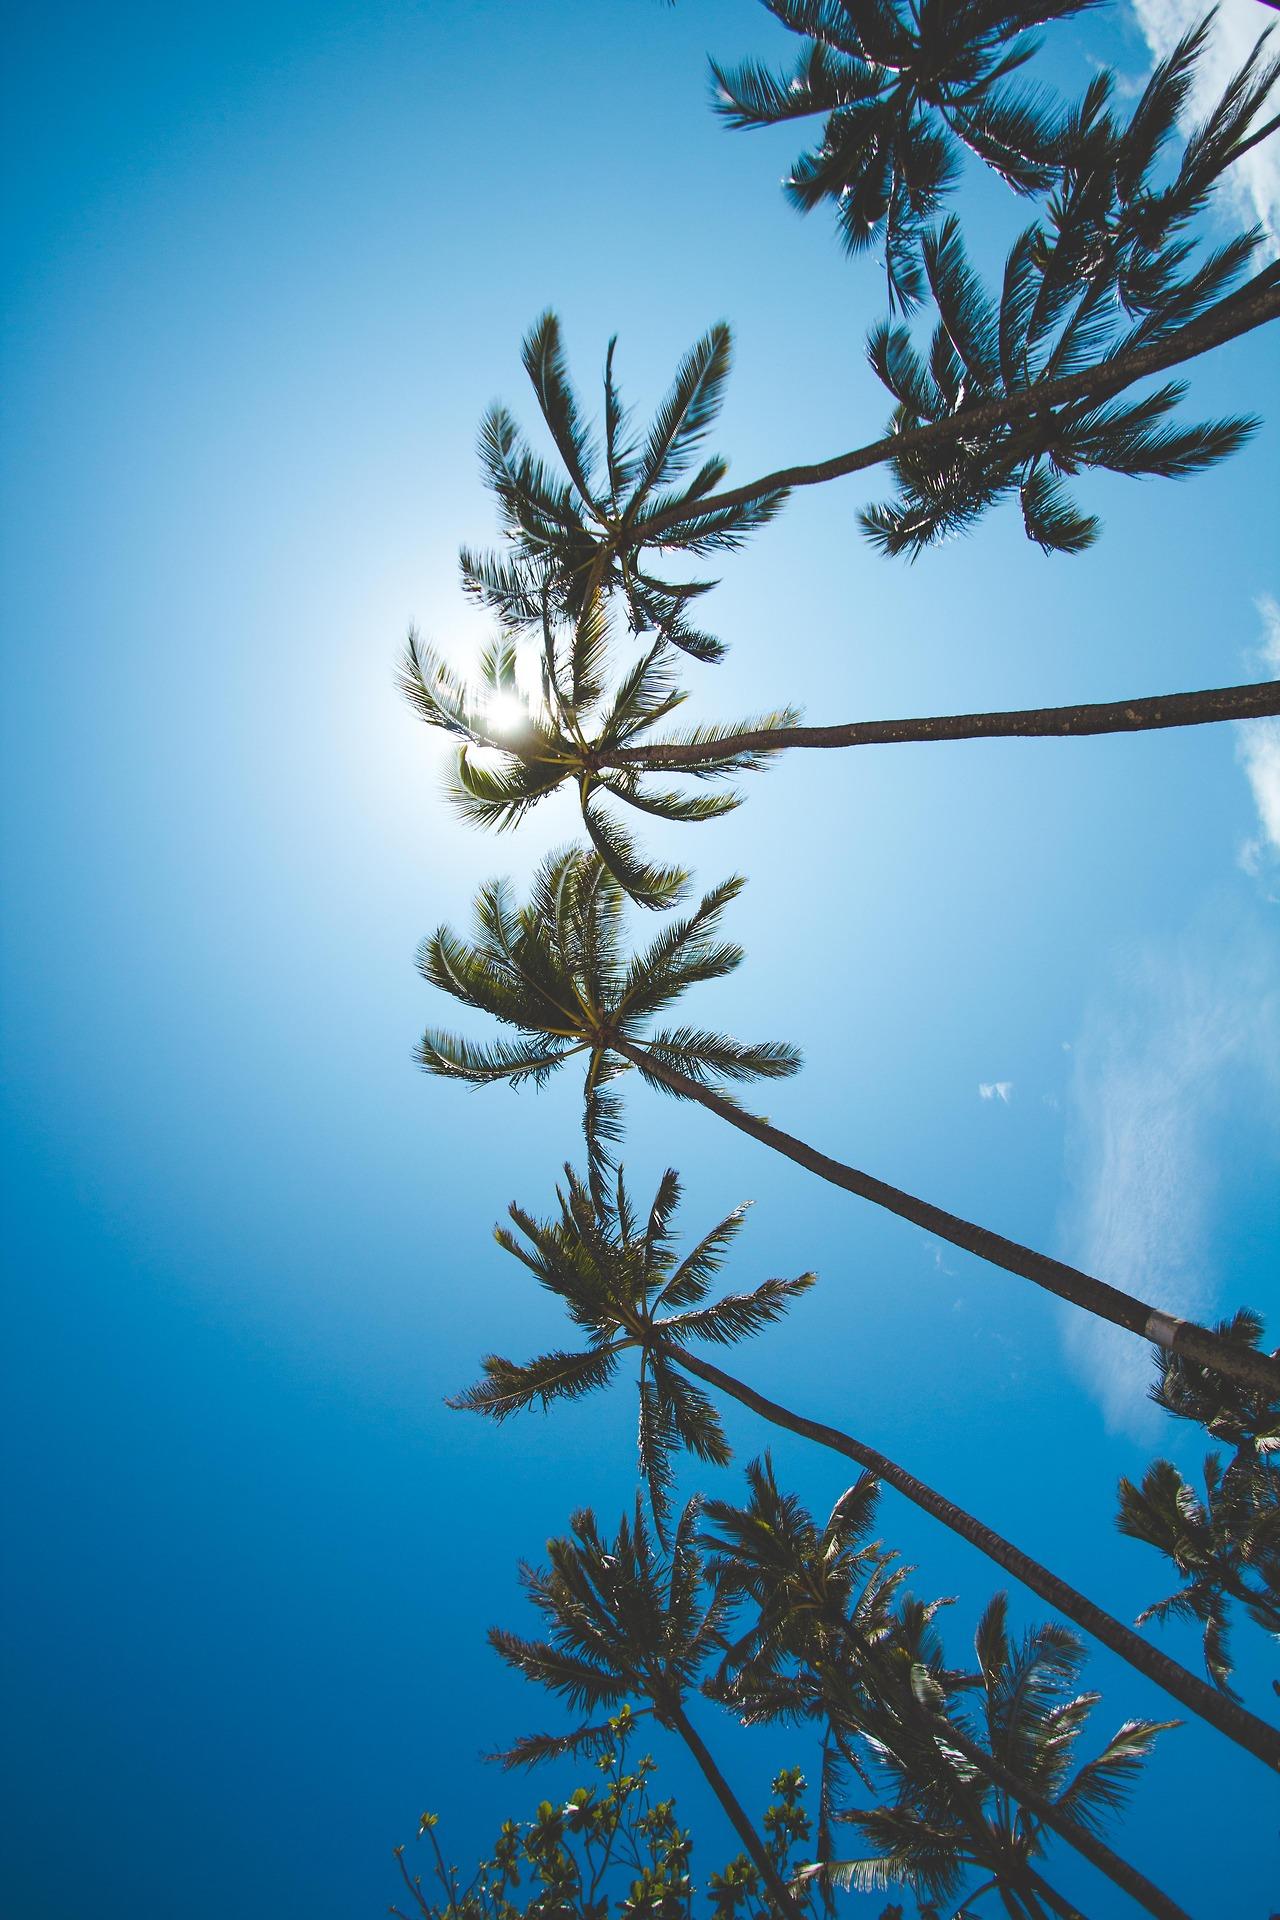 palms tree nature sky season cold light outdoors flora